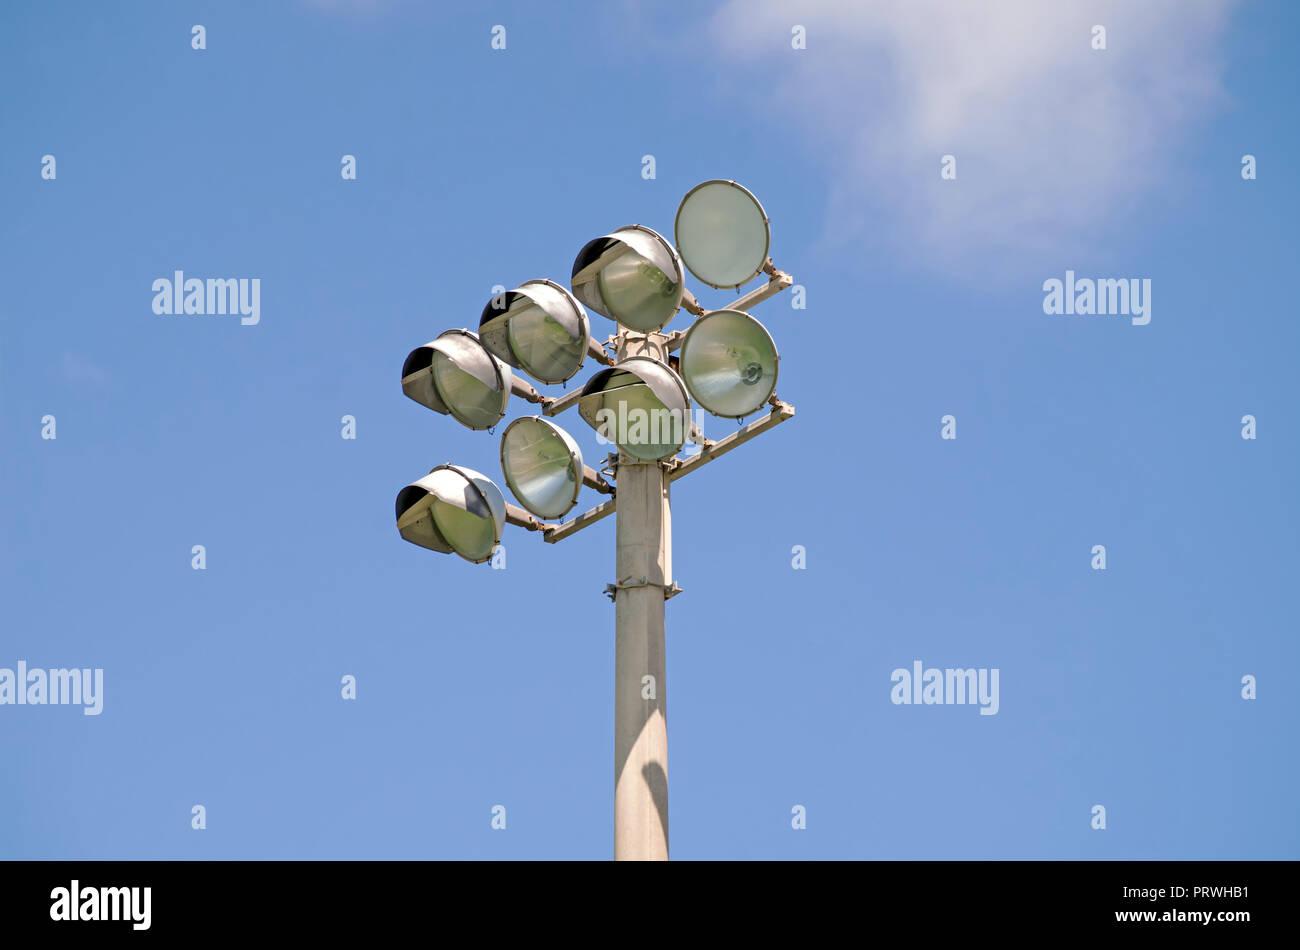 Stadium lights, unlit, against blue sky. Cabaniss football field in Corpus Christi, Texas USA. - Stock Image